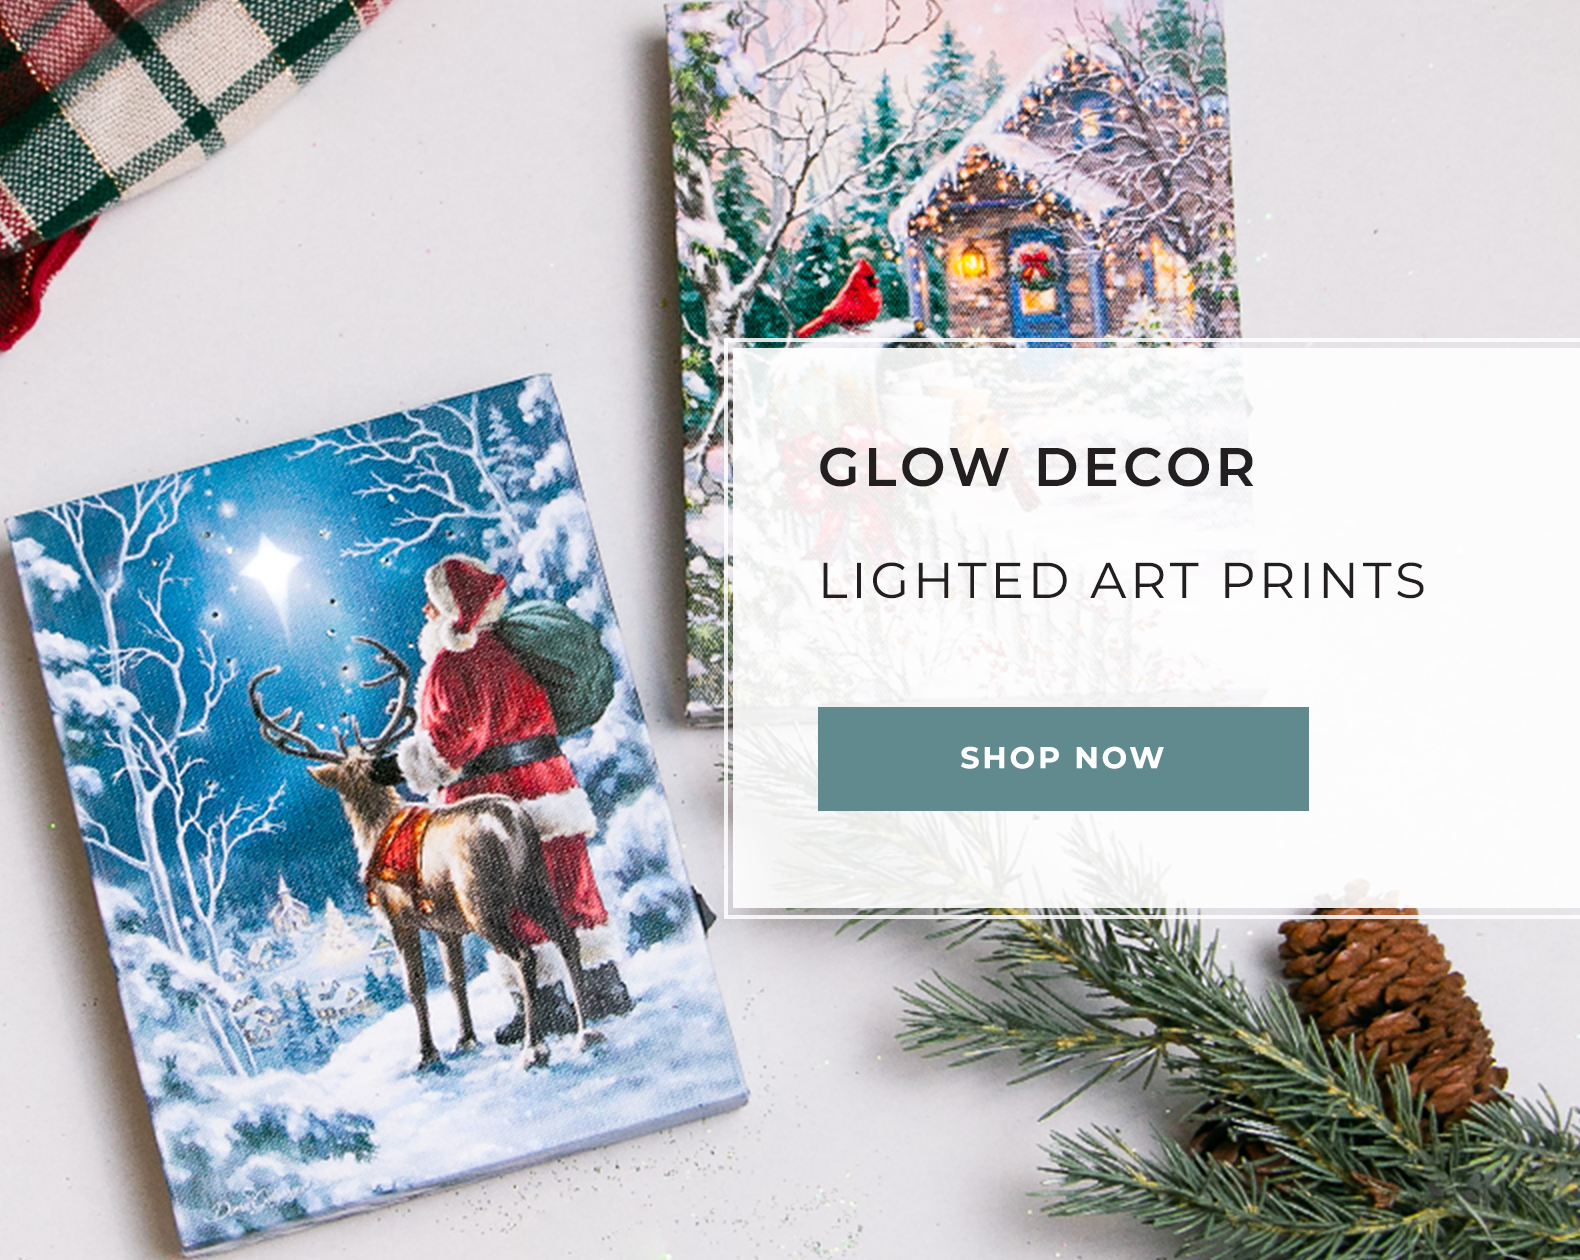 Glow Decor - Lighted Art Prints